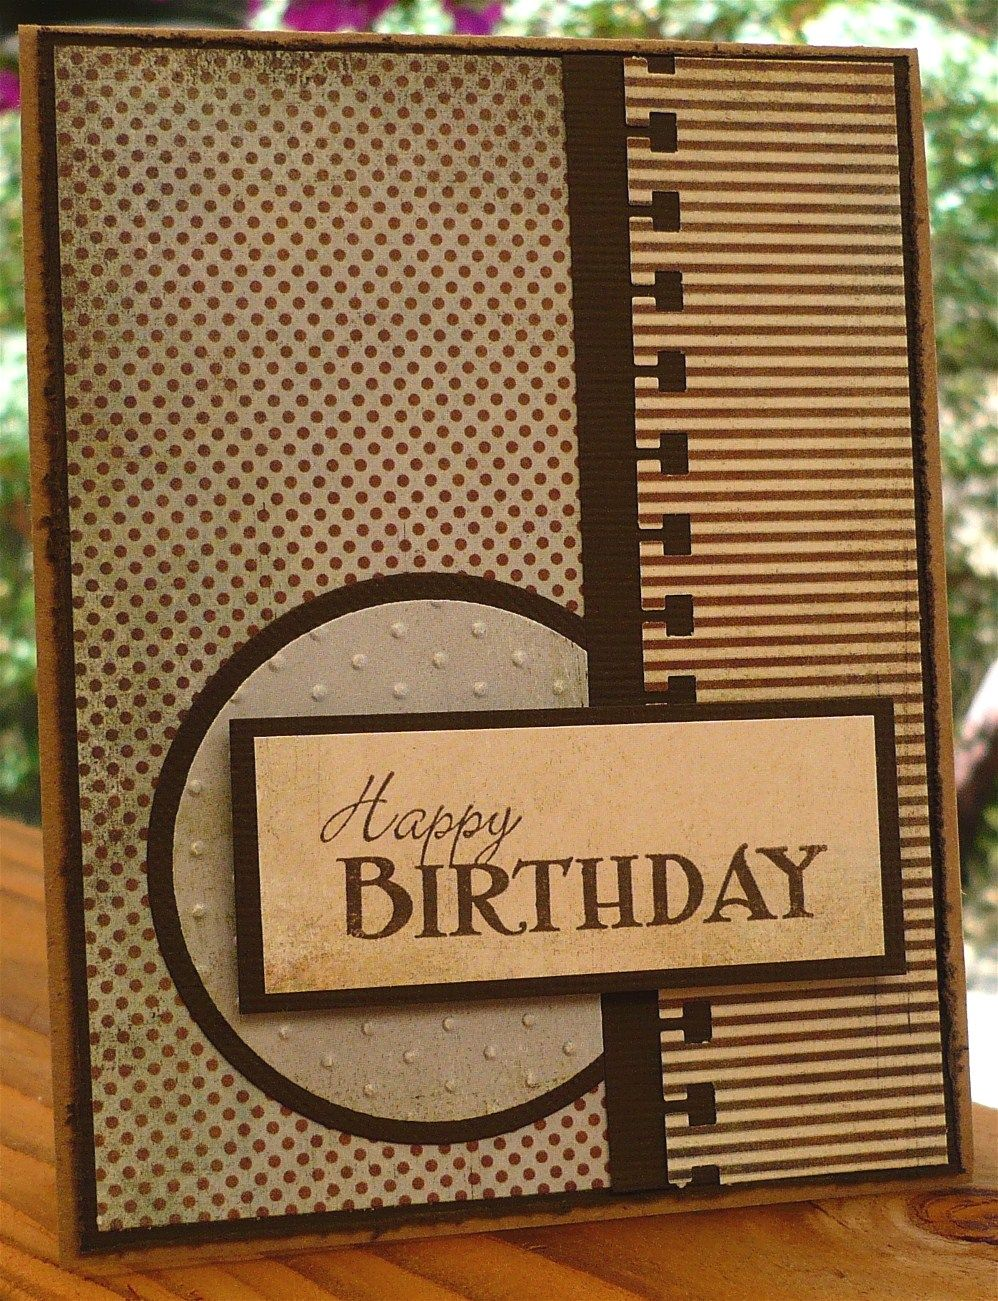 Bday Card Masculine Birthday Cards Birthday Cards Masculine Cards